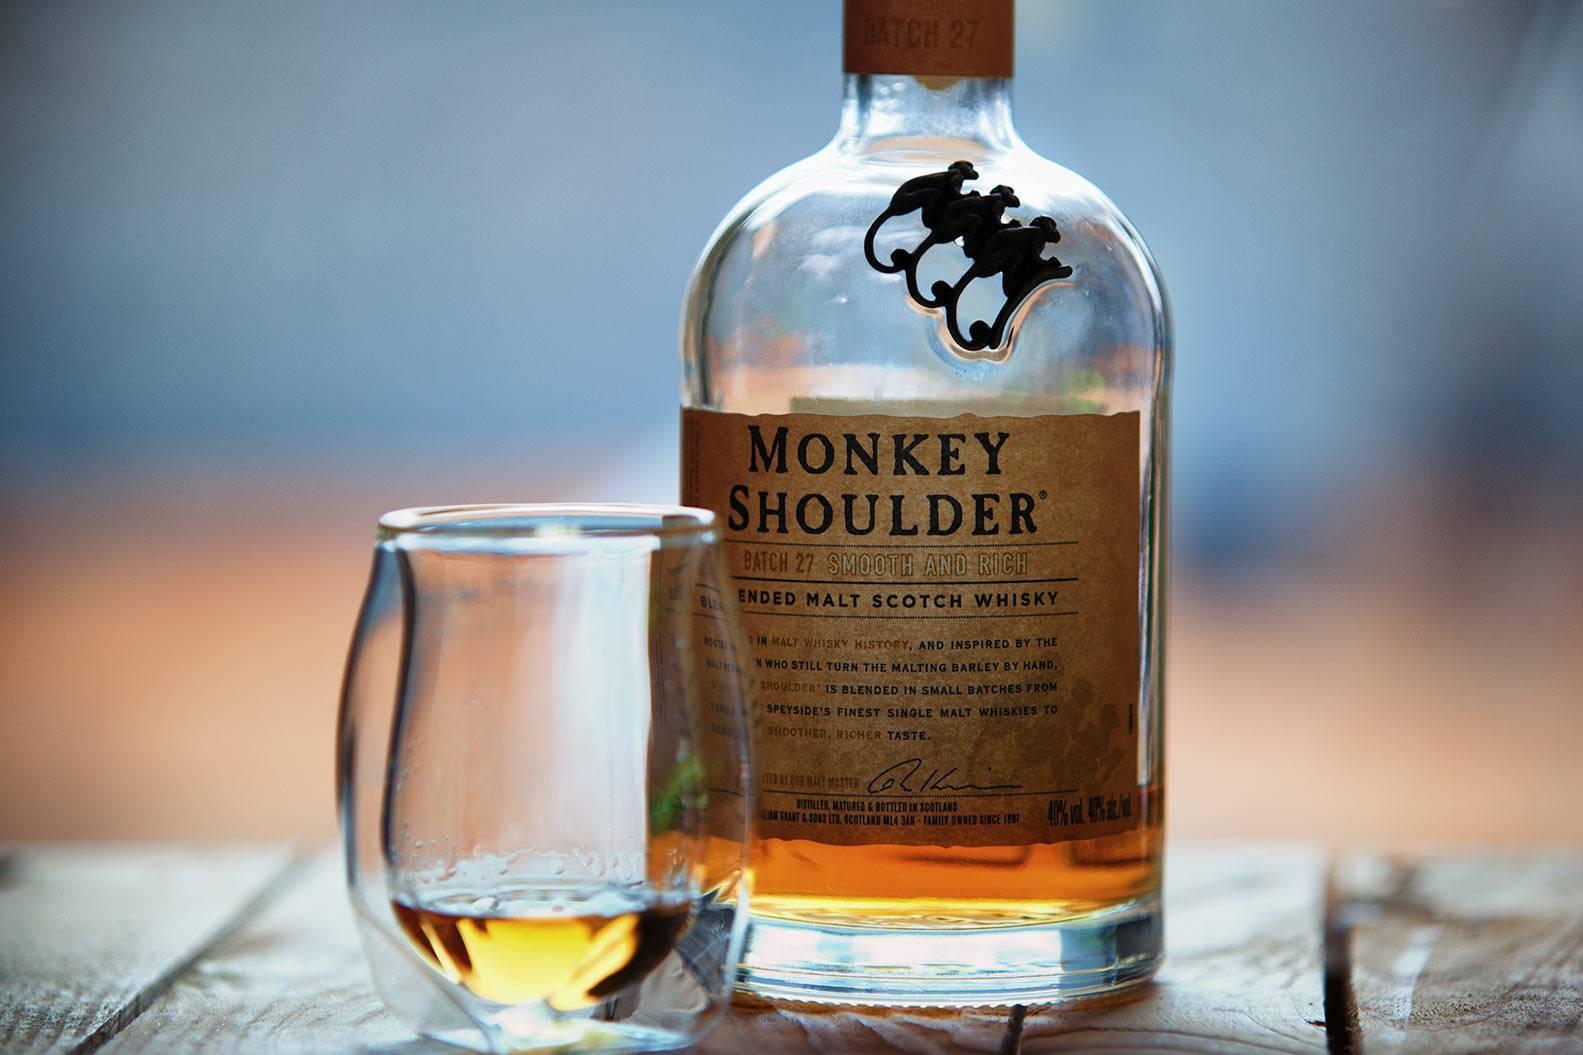 Виски monkey shoulder (манки шолдер, обезьянье плечо)